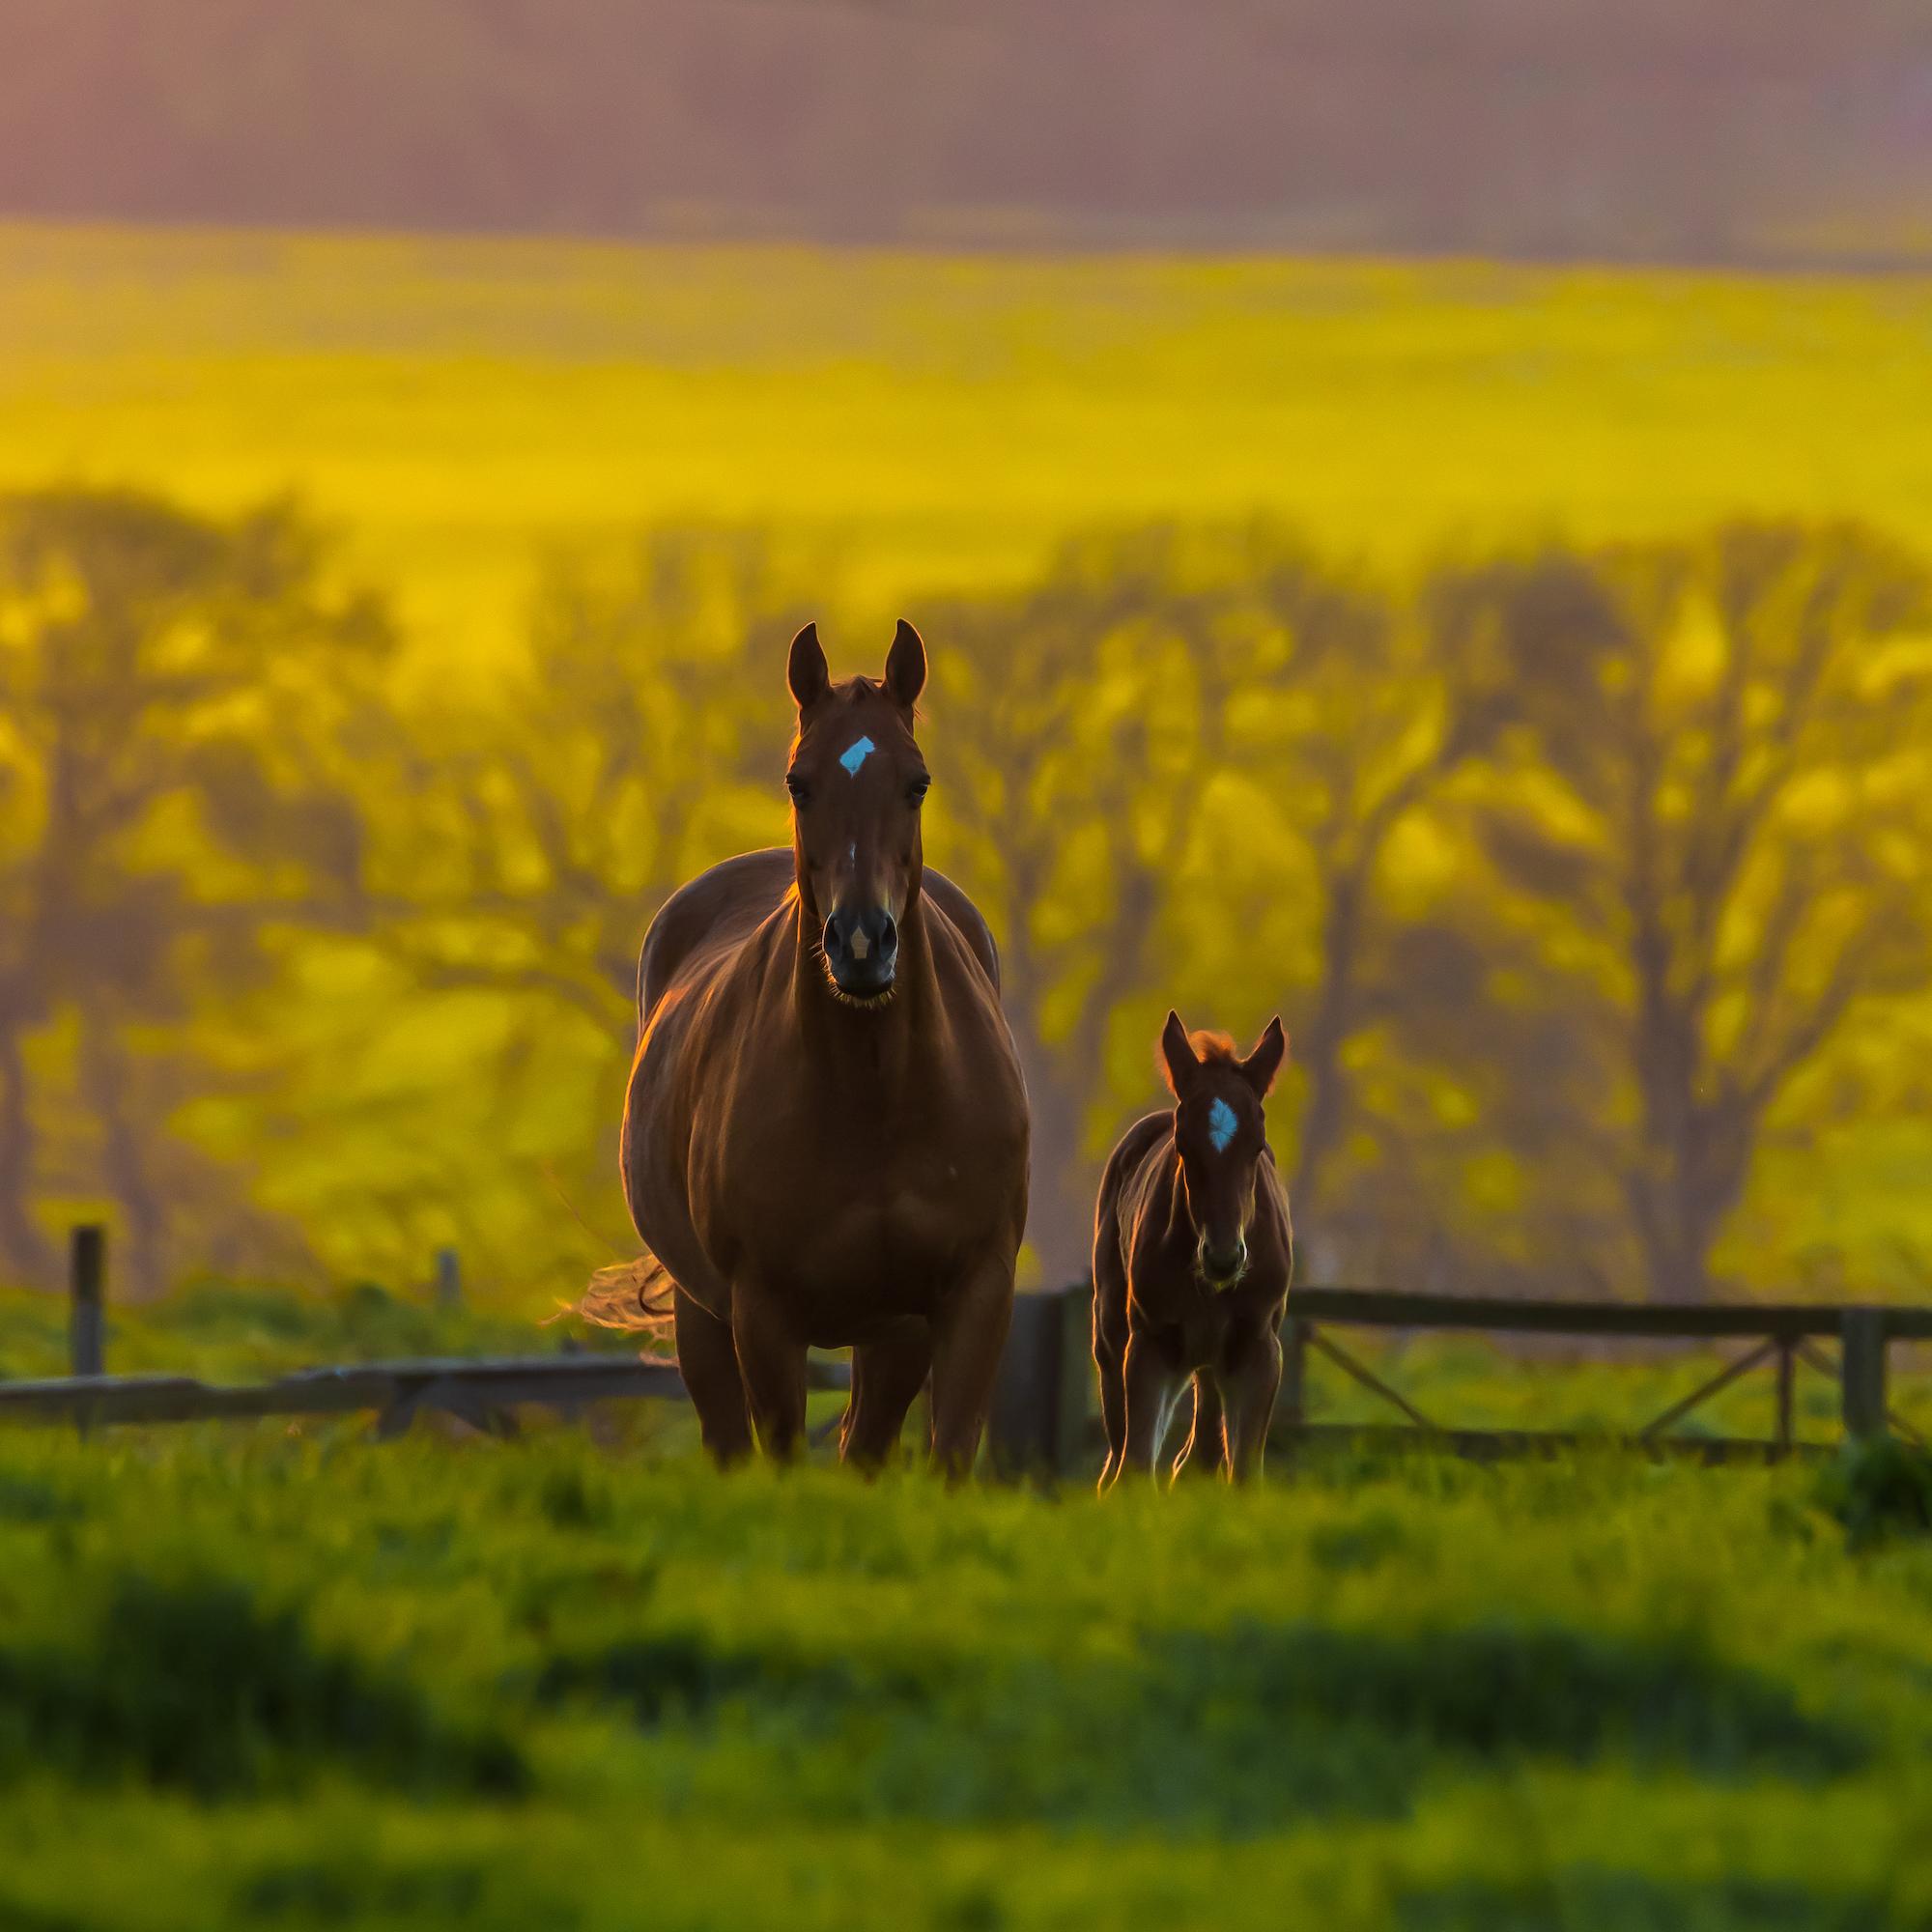 (1369) Mother & Foal in Field, Horses at Bonnington Mains, Ratho, West Edinburgh, Scotland. May 2019. Copyright David Wheater.jpg